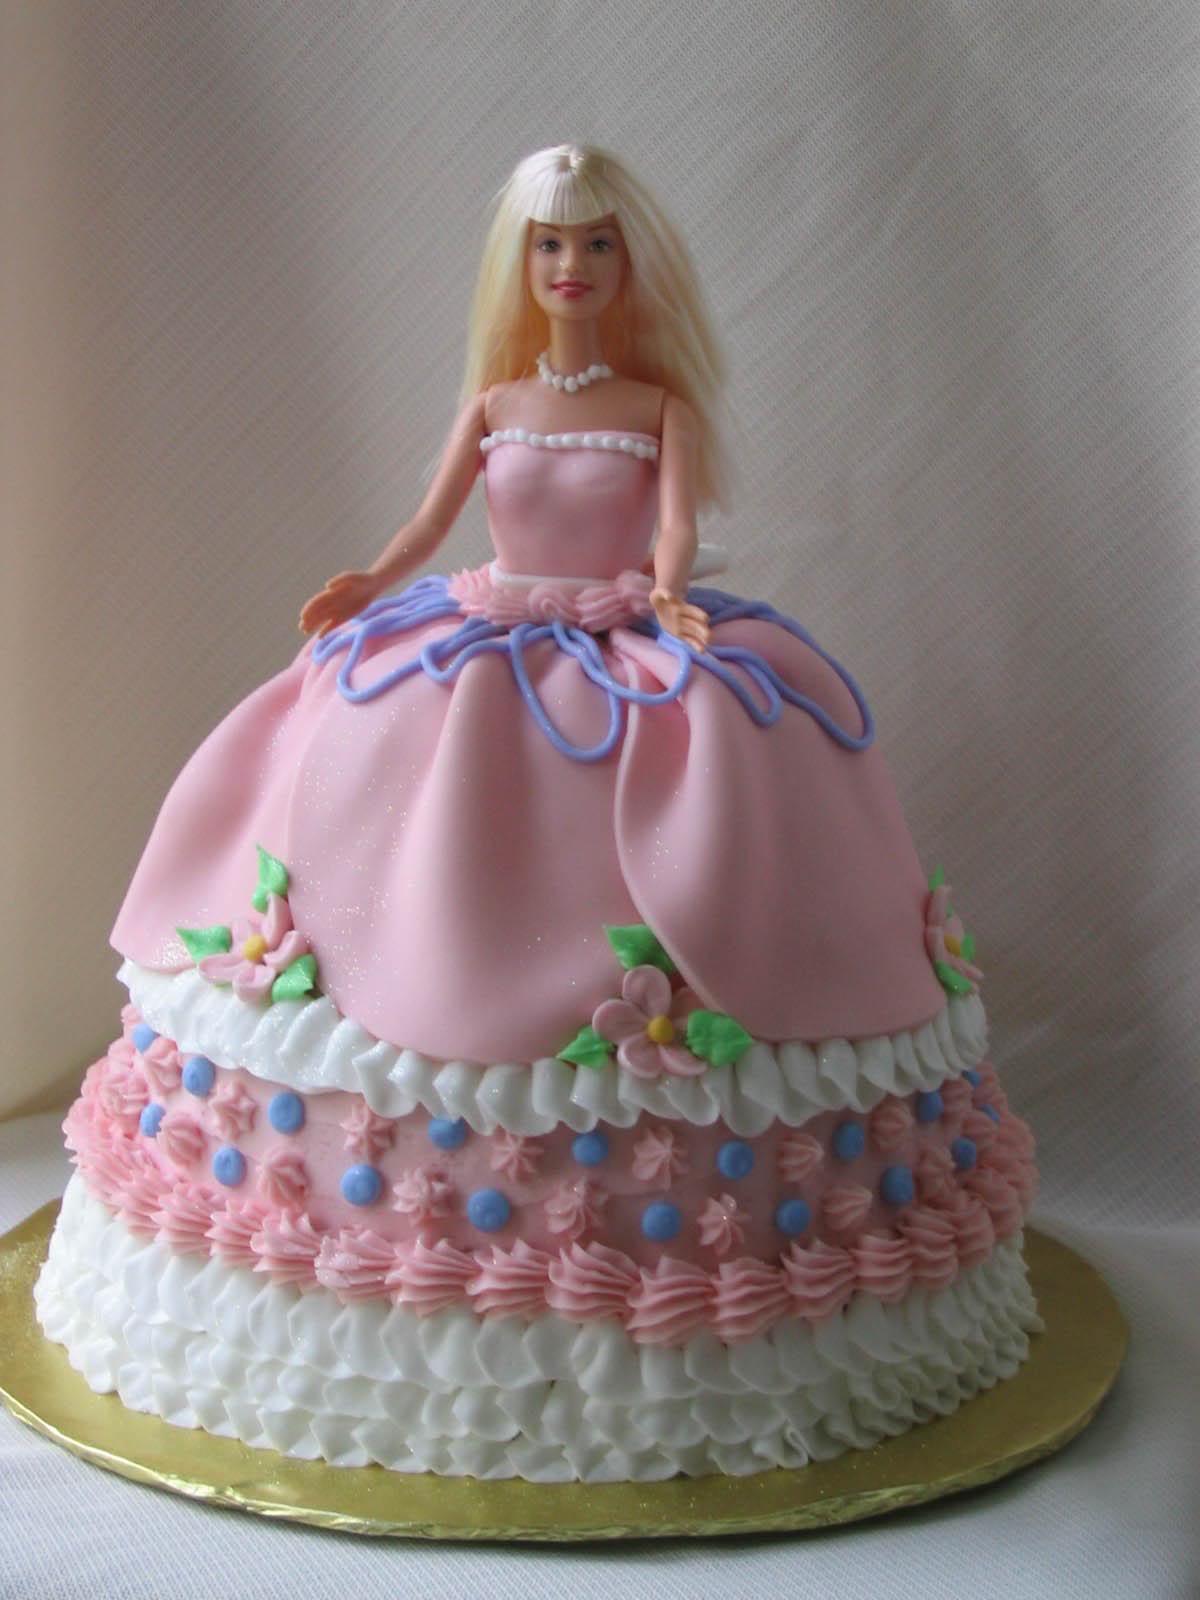 Superb 12 Barbie Birthday Cakes For Girls Photo Barbie Birthday Cake Funny Birthday Cards Online Elaedamsfinfo